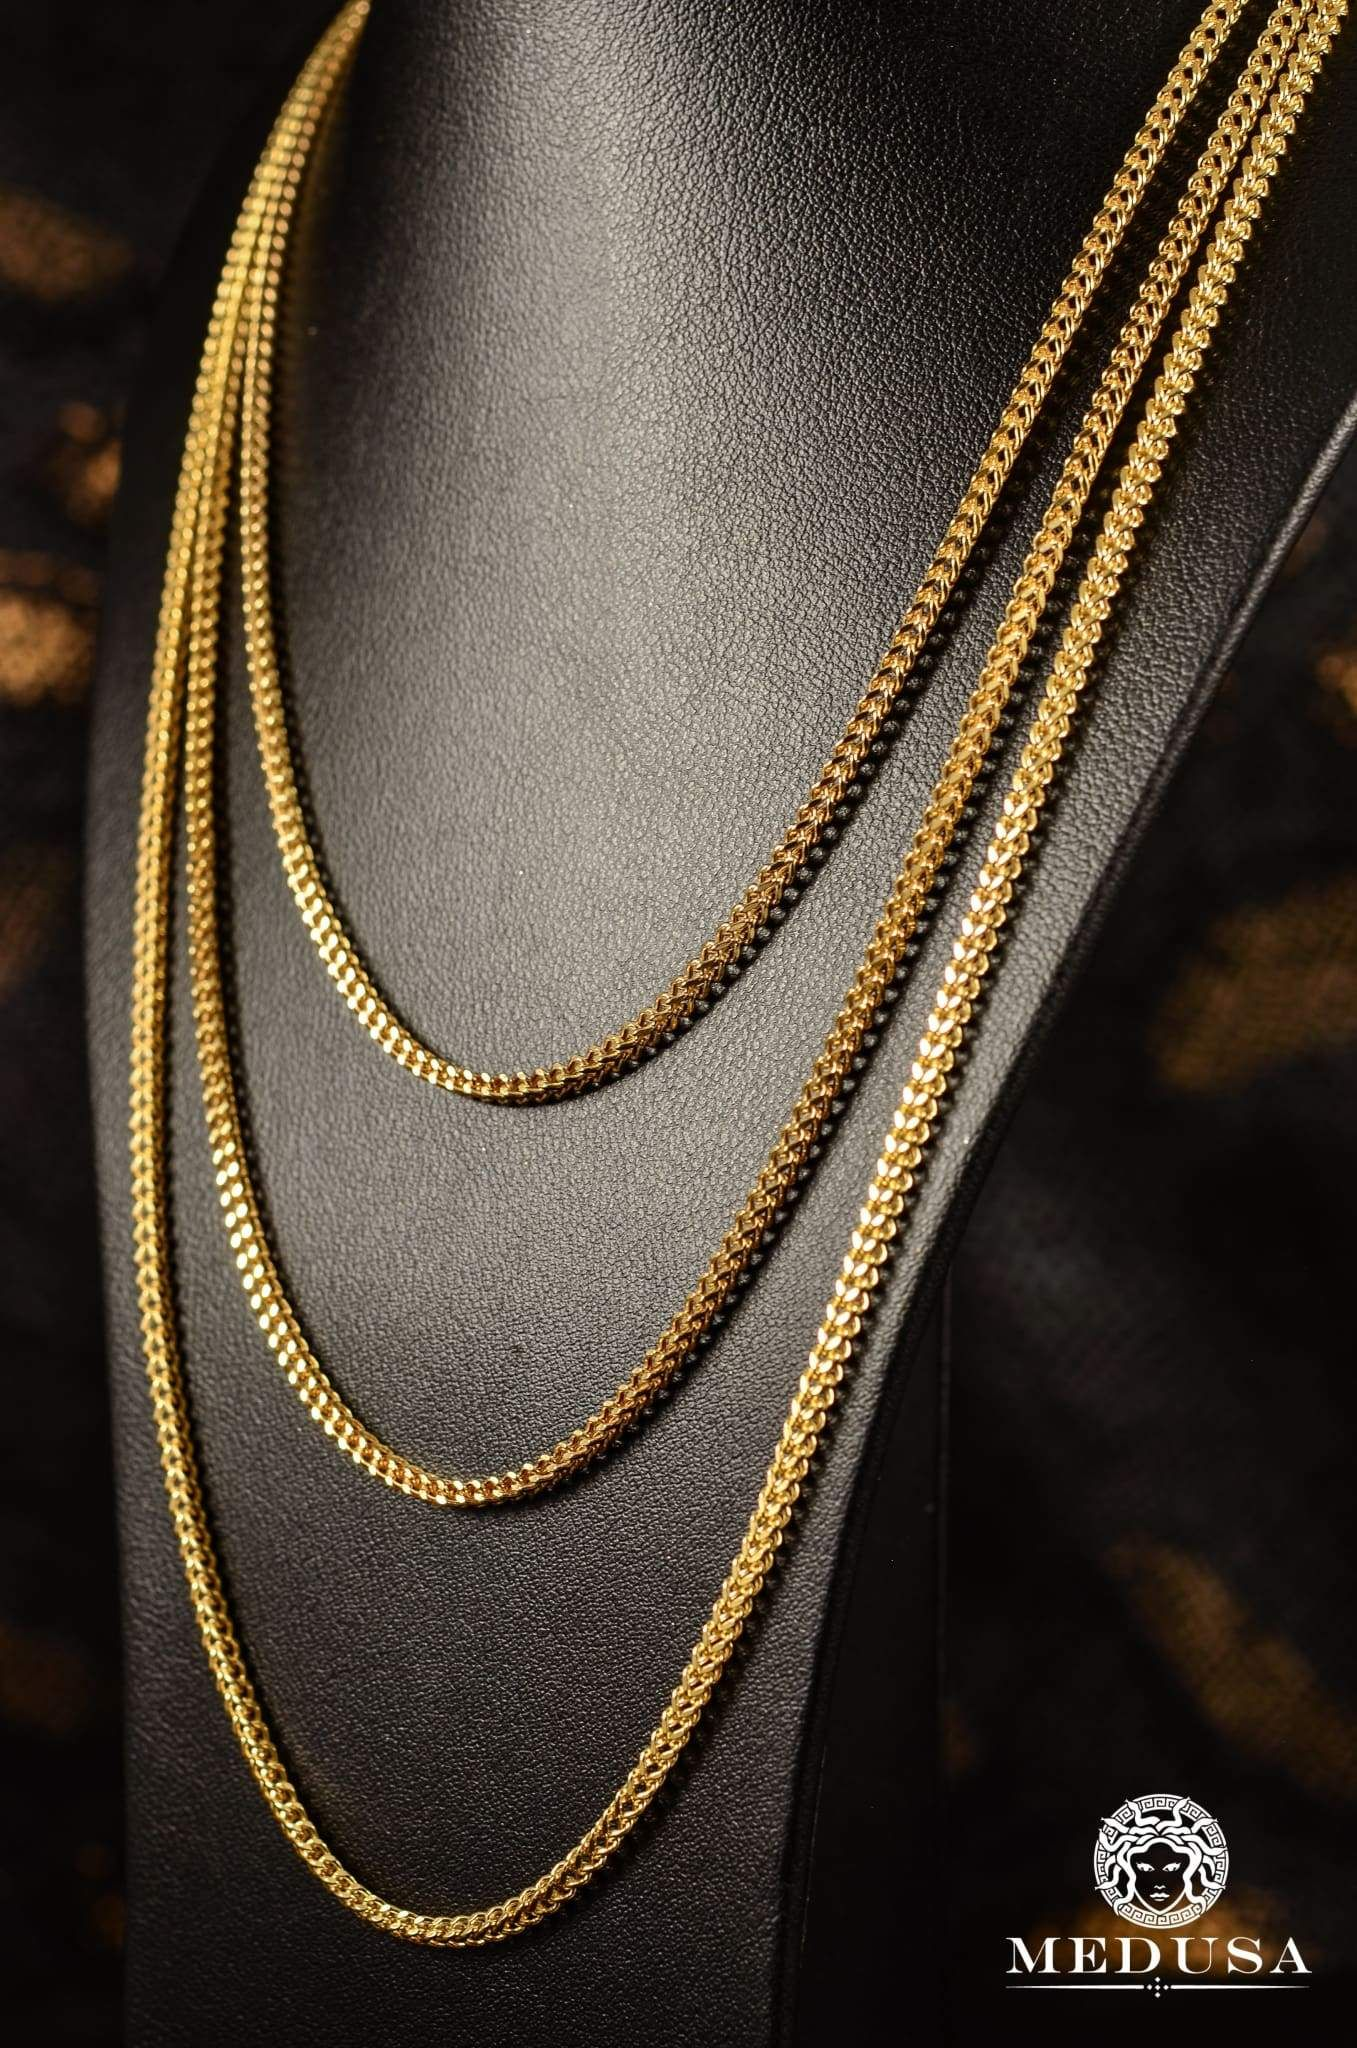 2mm Franco Gold Chains For Men Gold Chain Design Gold Mangalsutra Designs